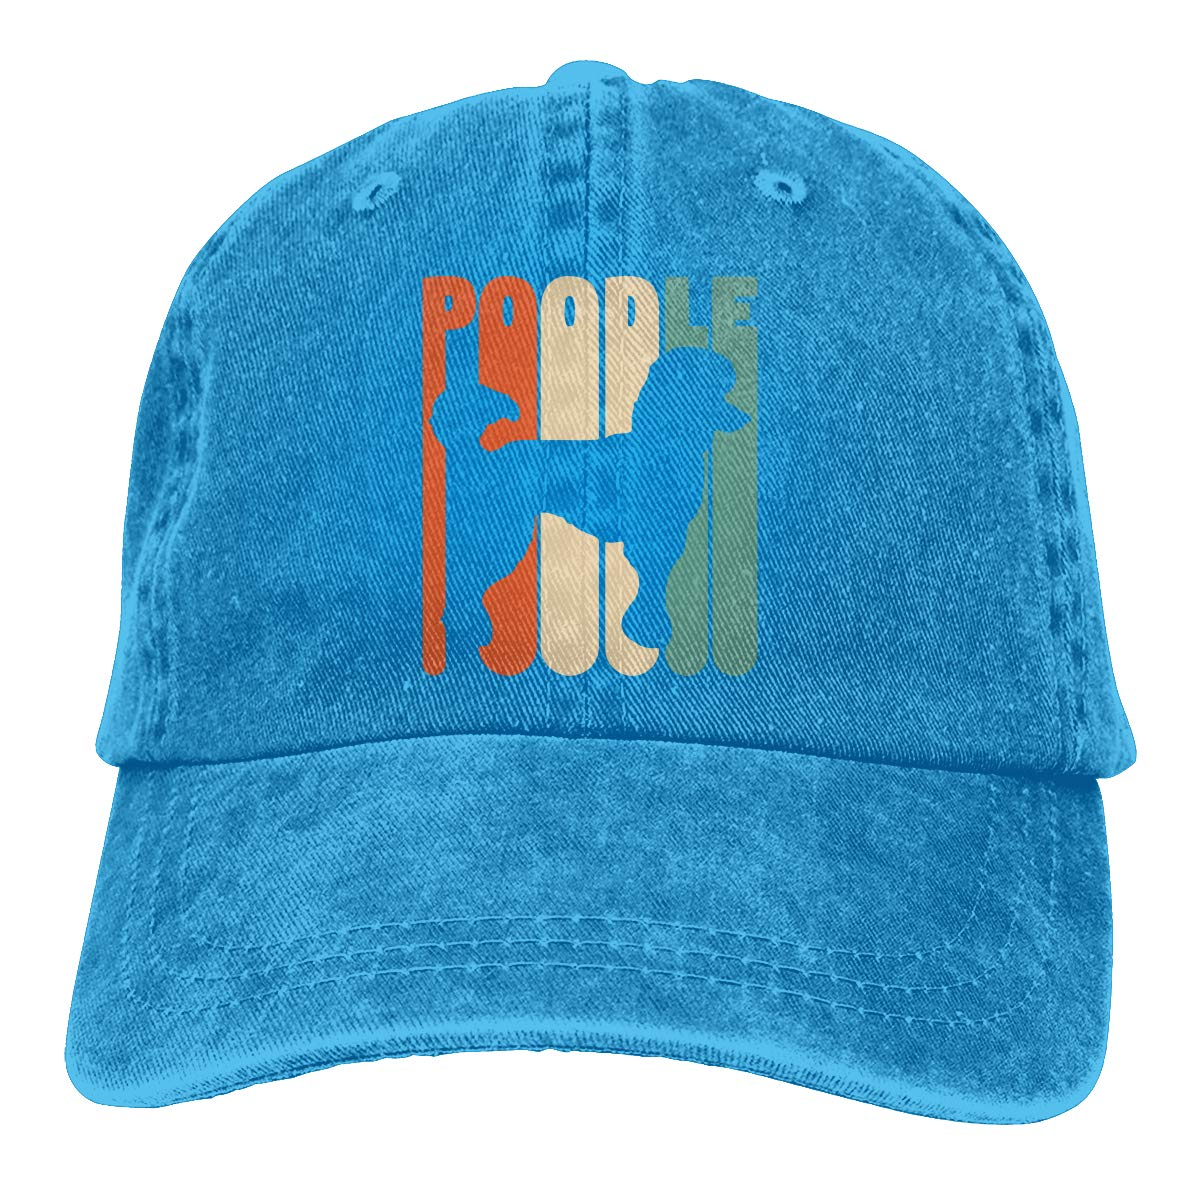 Vintage Poodle Adult Personalize Cowboy Sun Hat Adjustable Baseball Cap